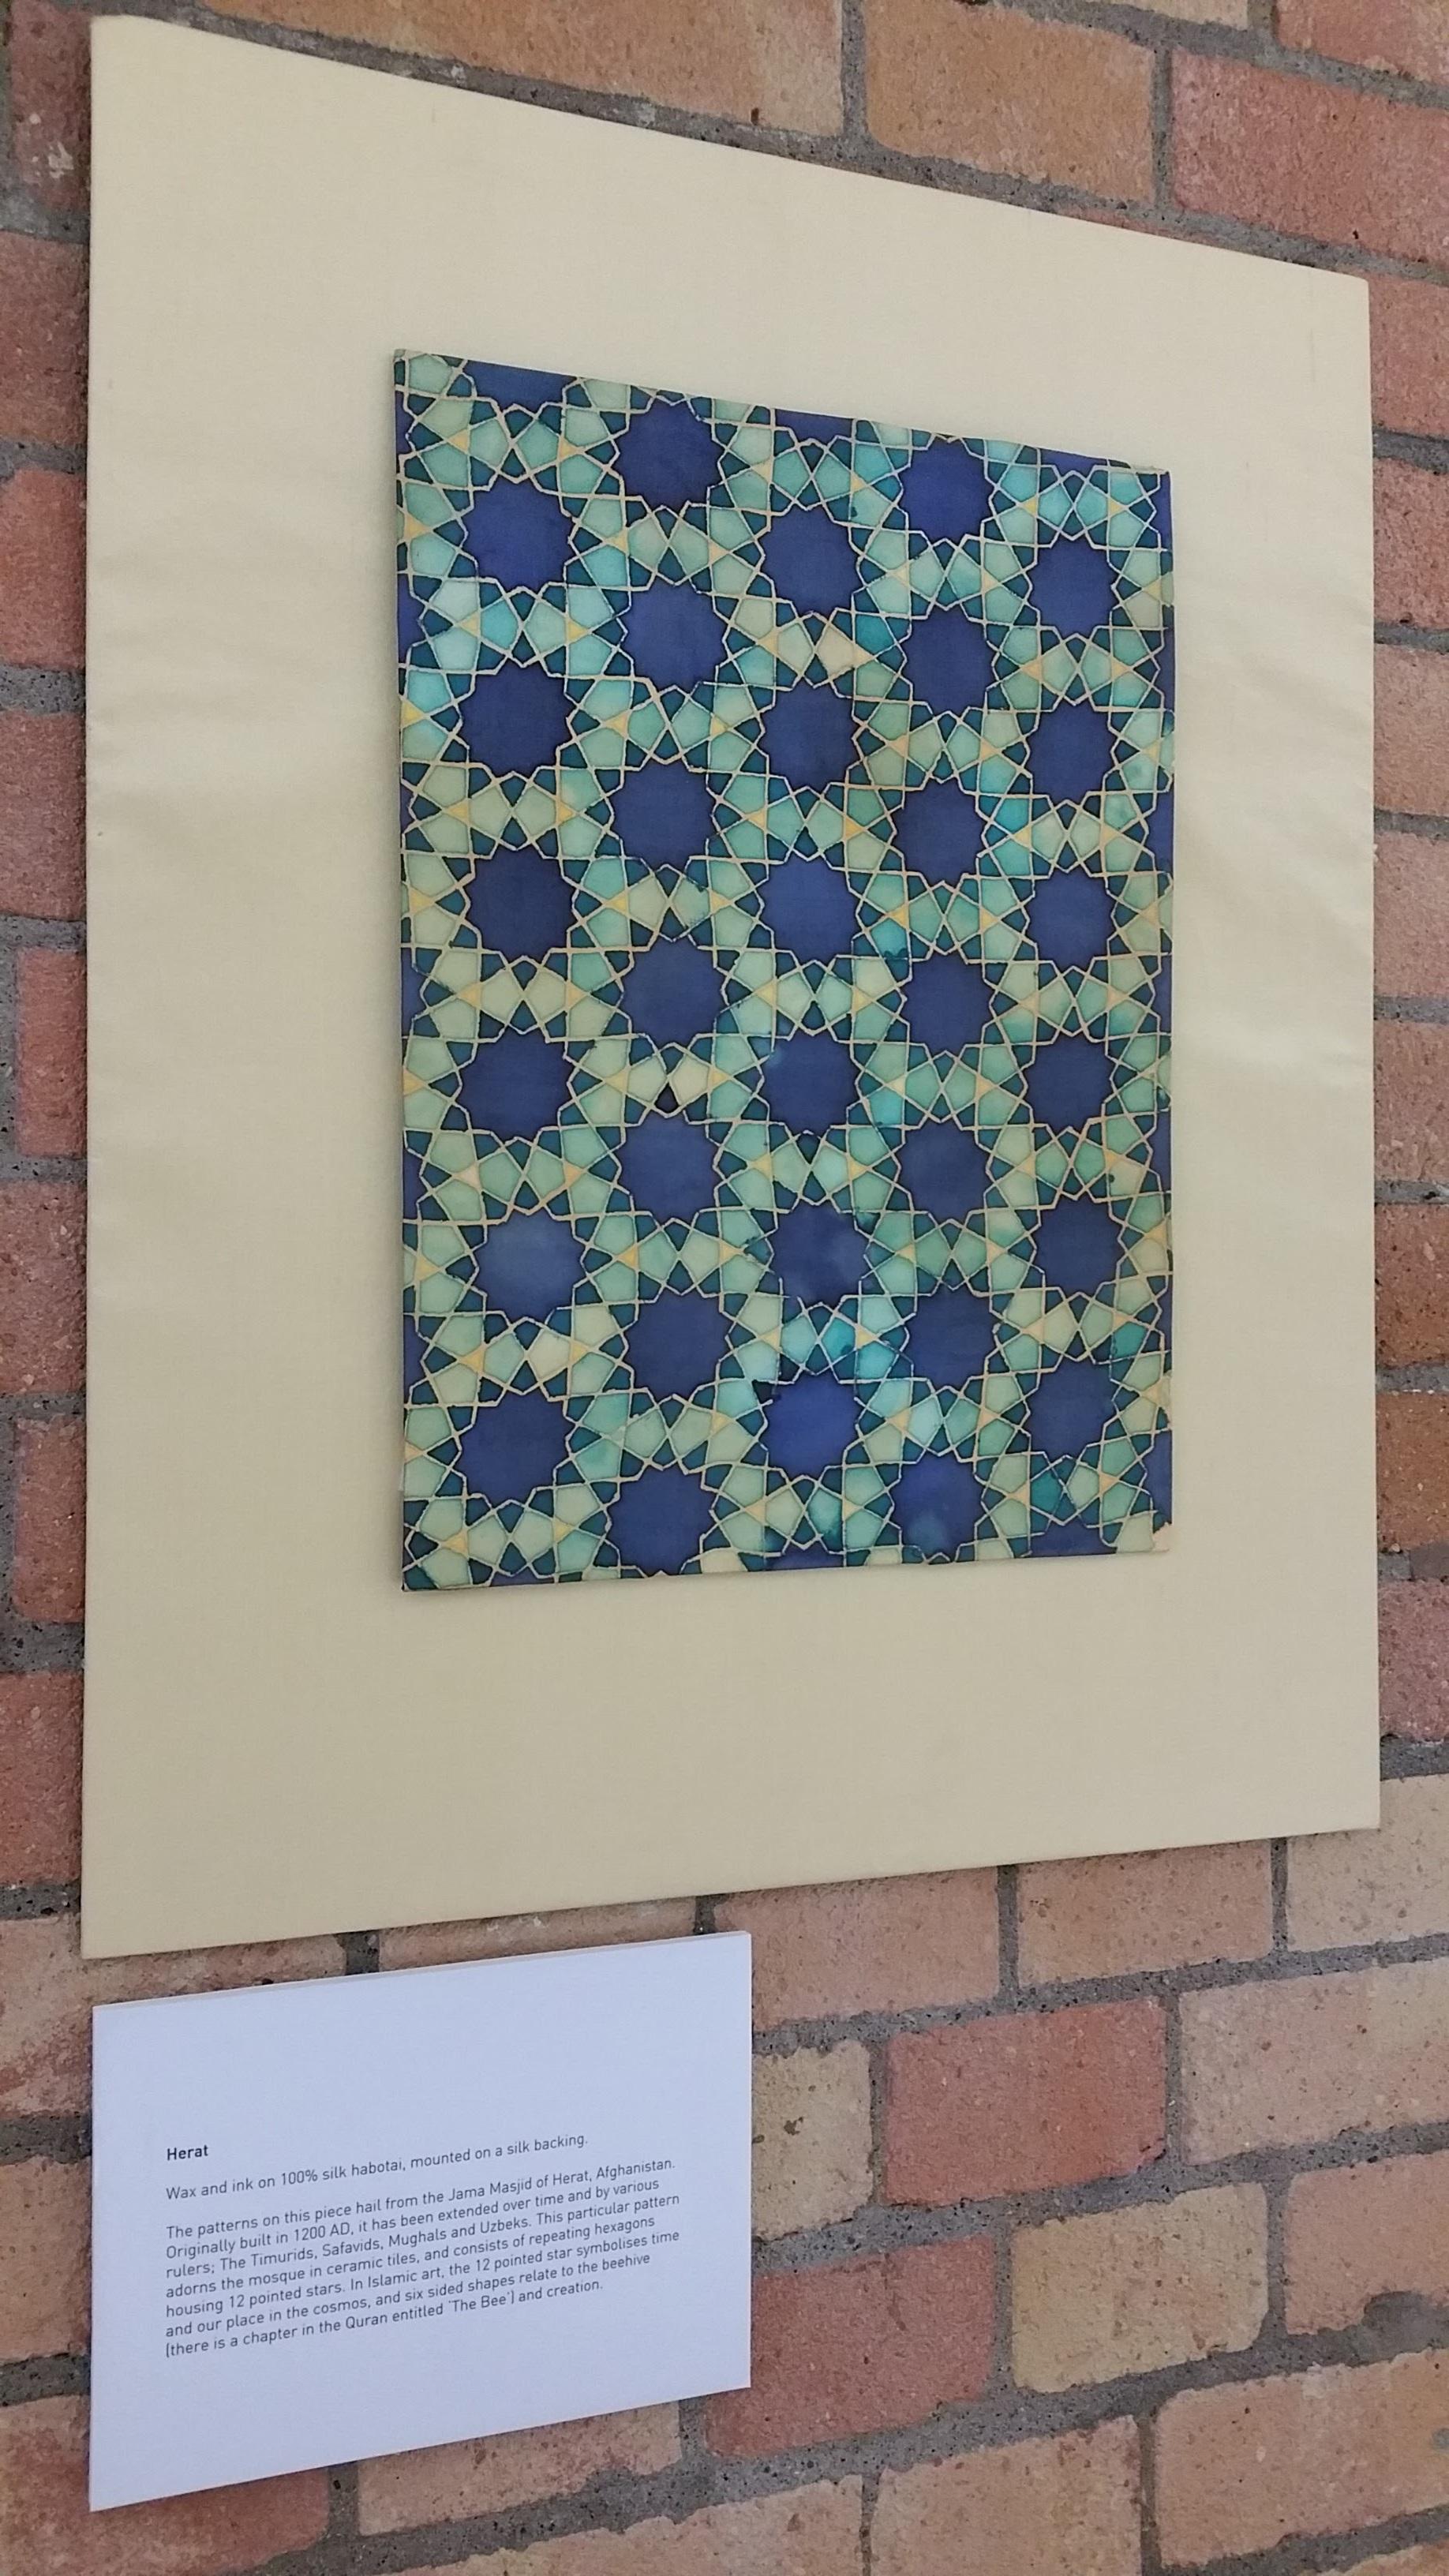 Herat ~ Geometry, Islamic Art, Pattern Design, Shaheen Kasmani